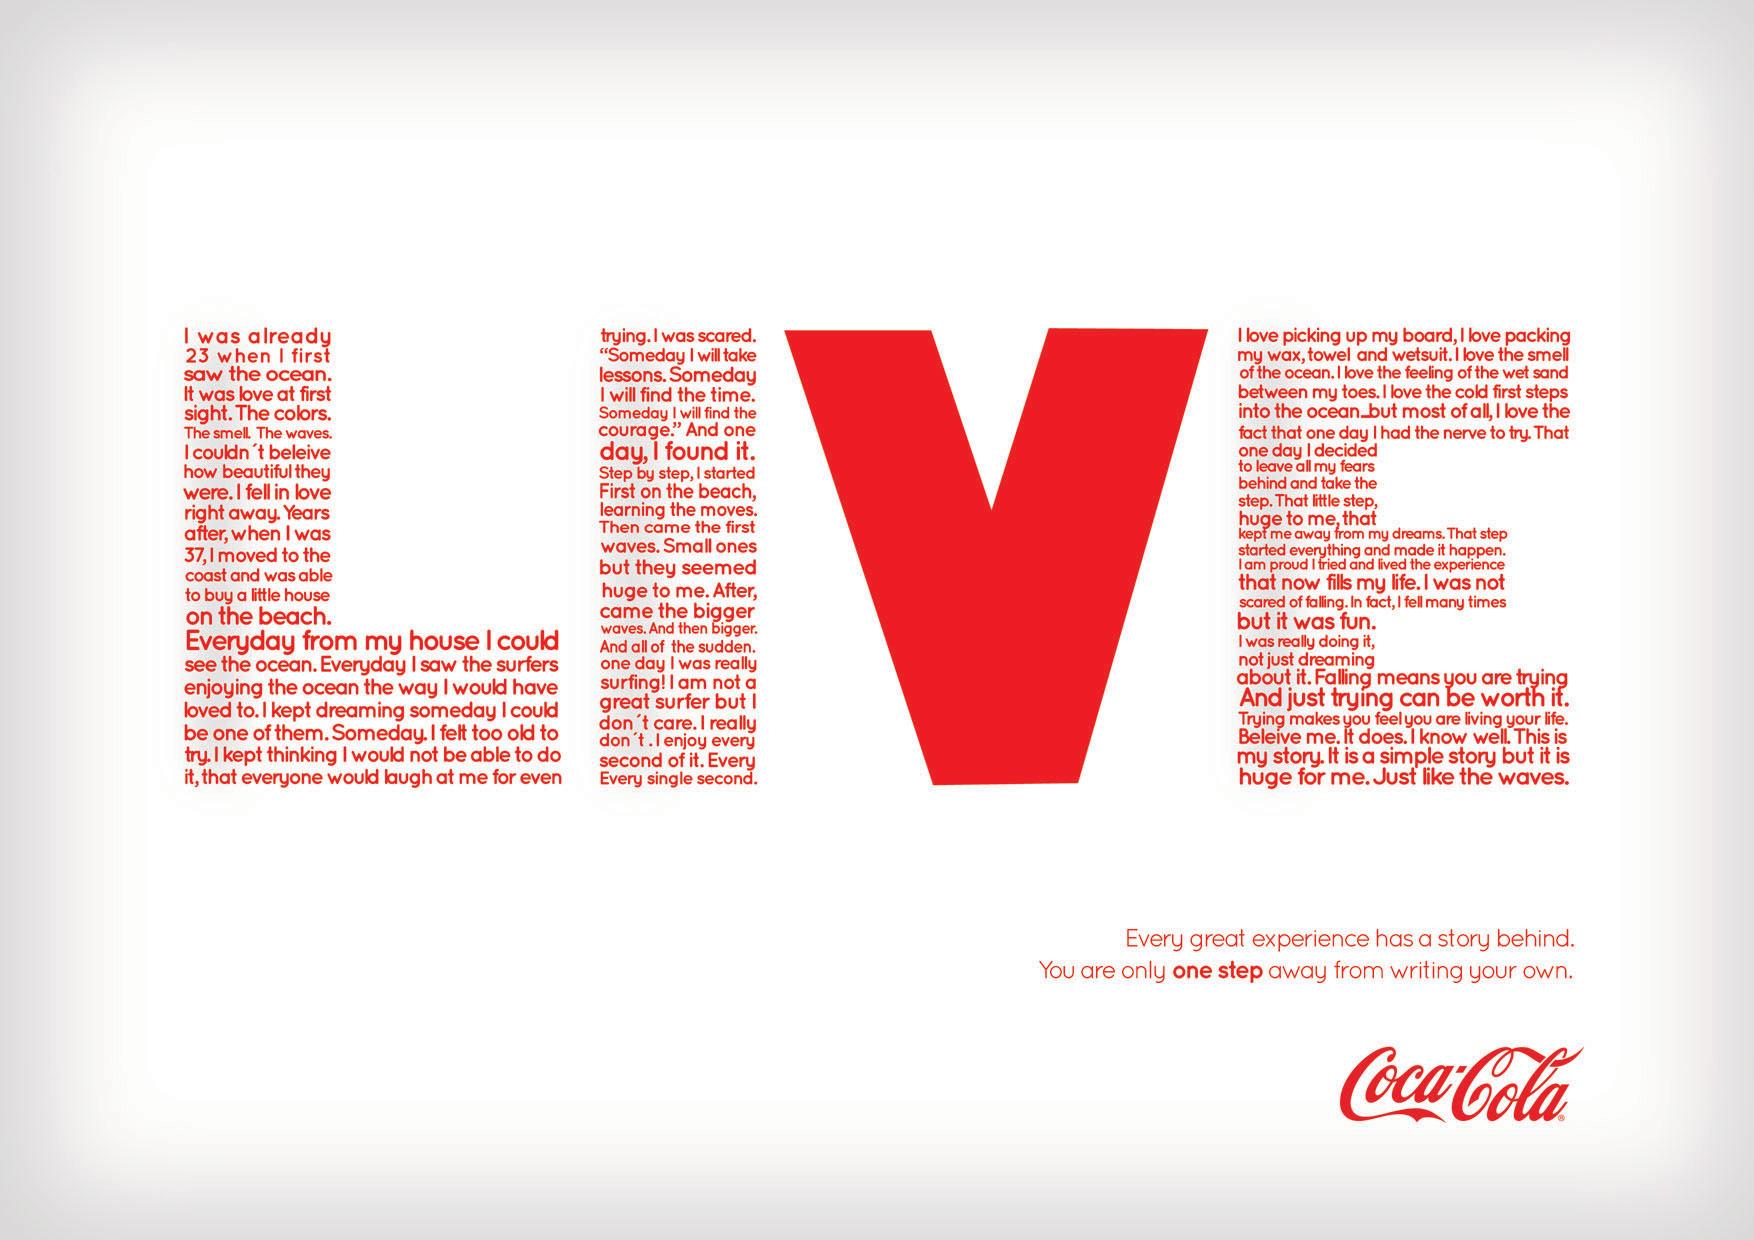 Mondays at work gráfica ganadora de concurso para Coca-Cola